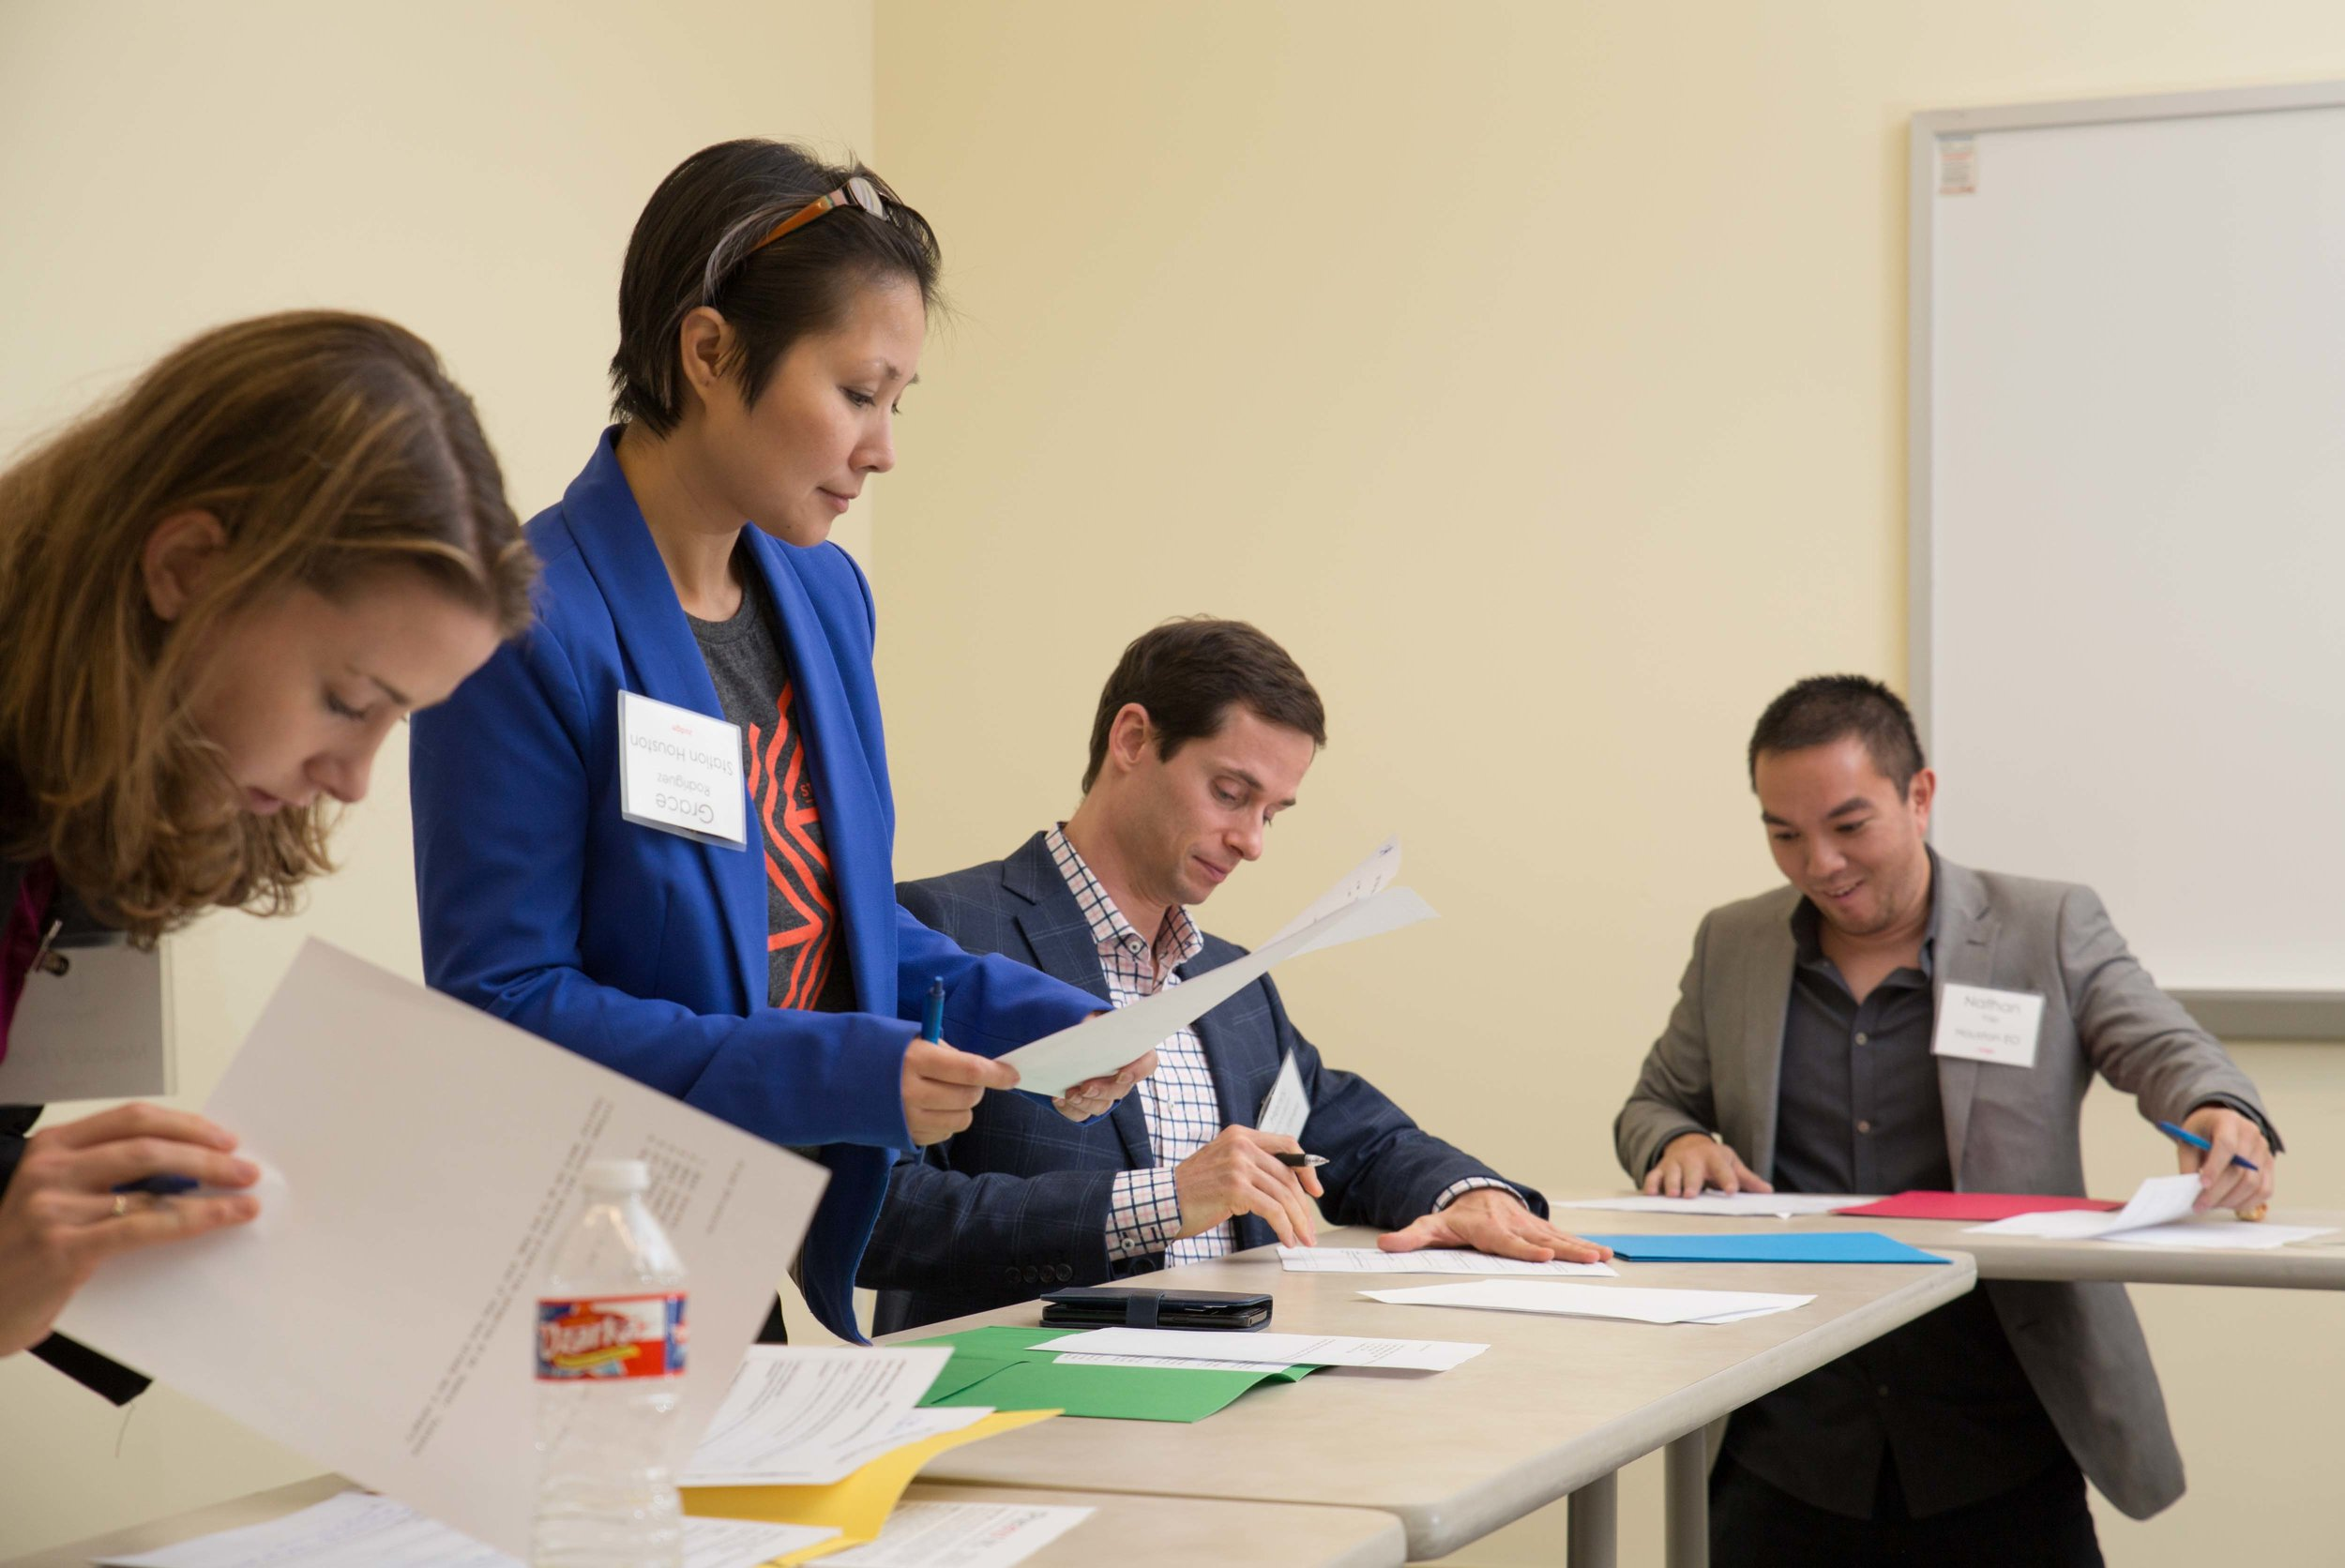 Rice University - Launch Challenge 29Mar2017-56Rice University - Launch Challenge 29Mar2017.JPG